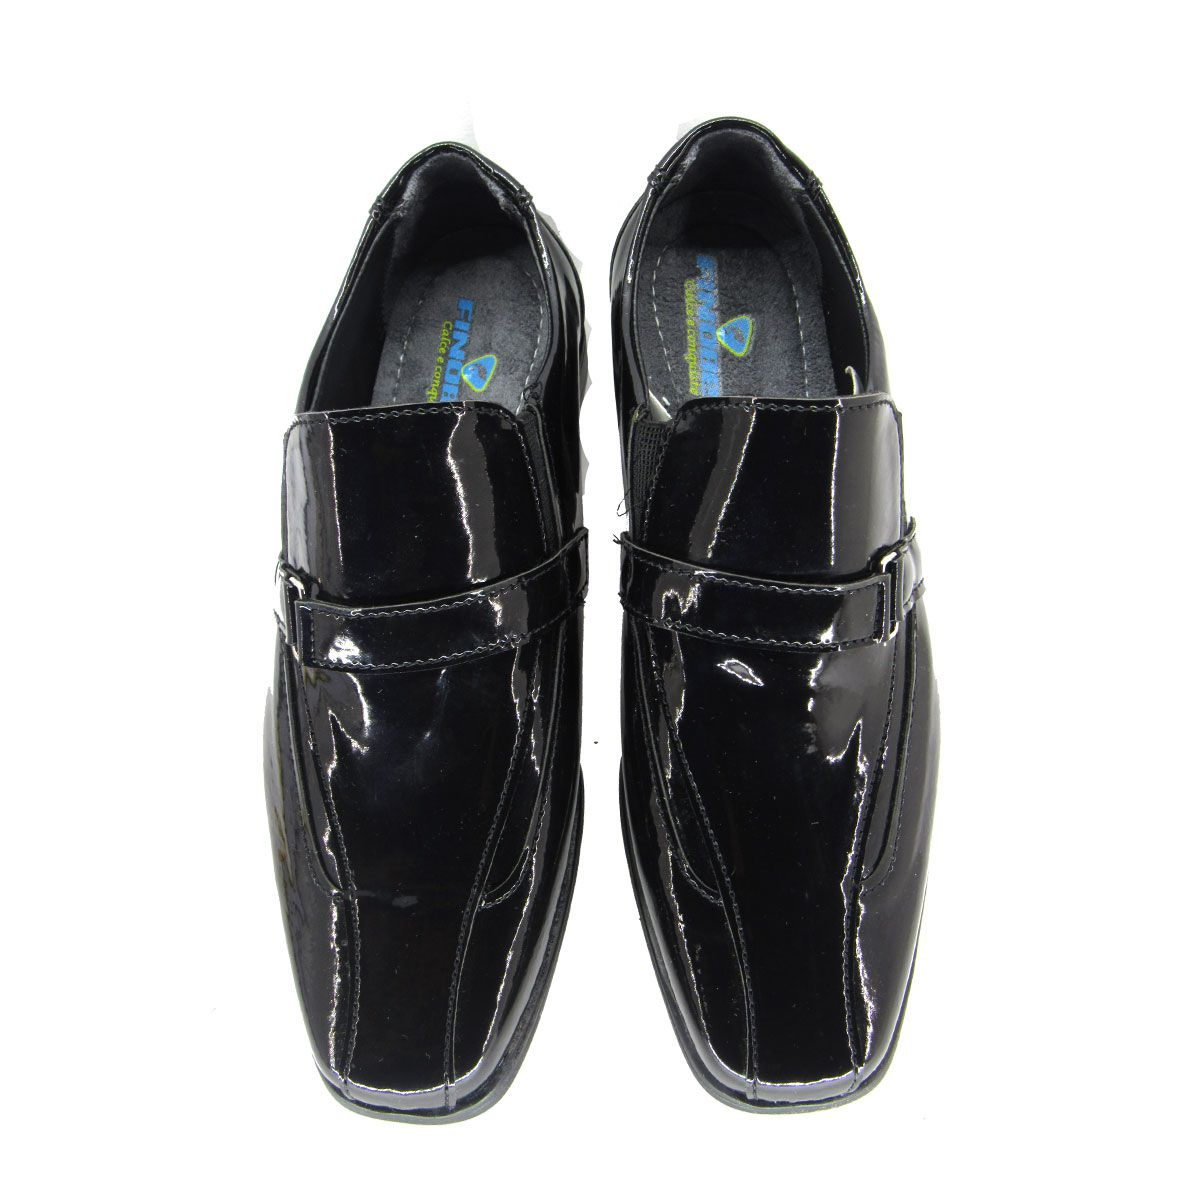 Sapato Social Infantil Masculino Finobel SC57 Preto